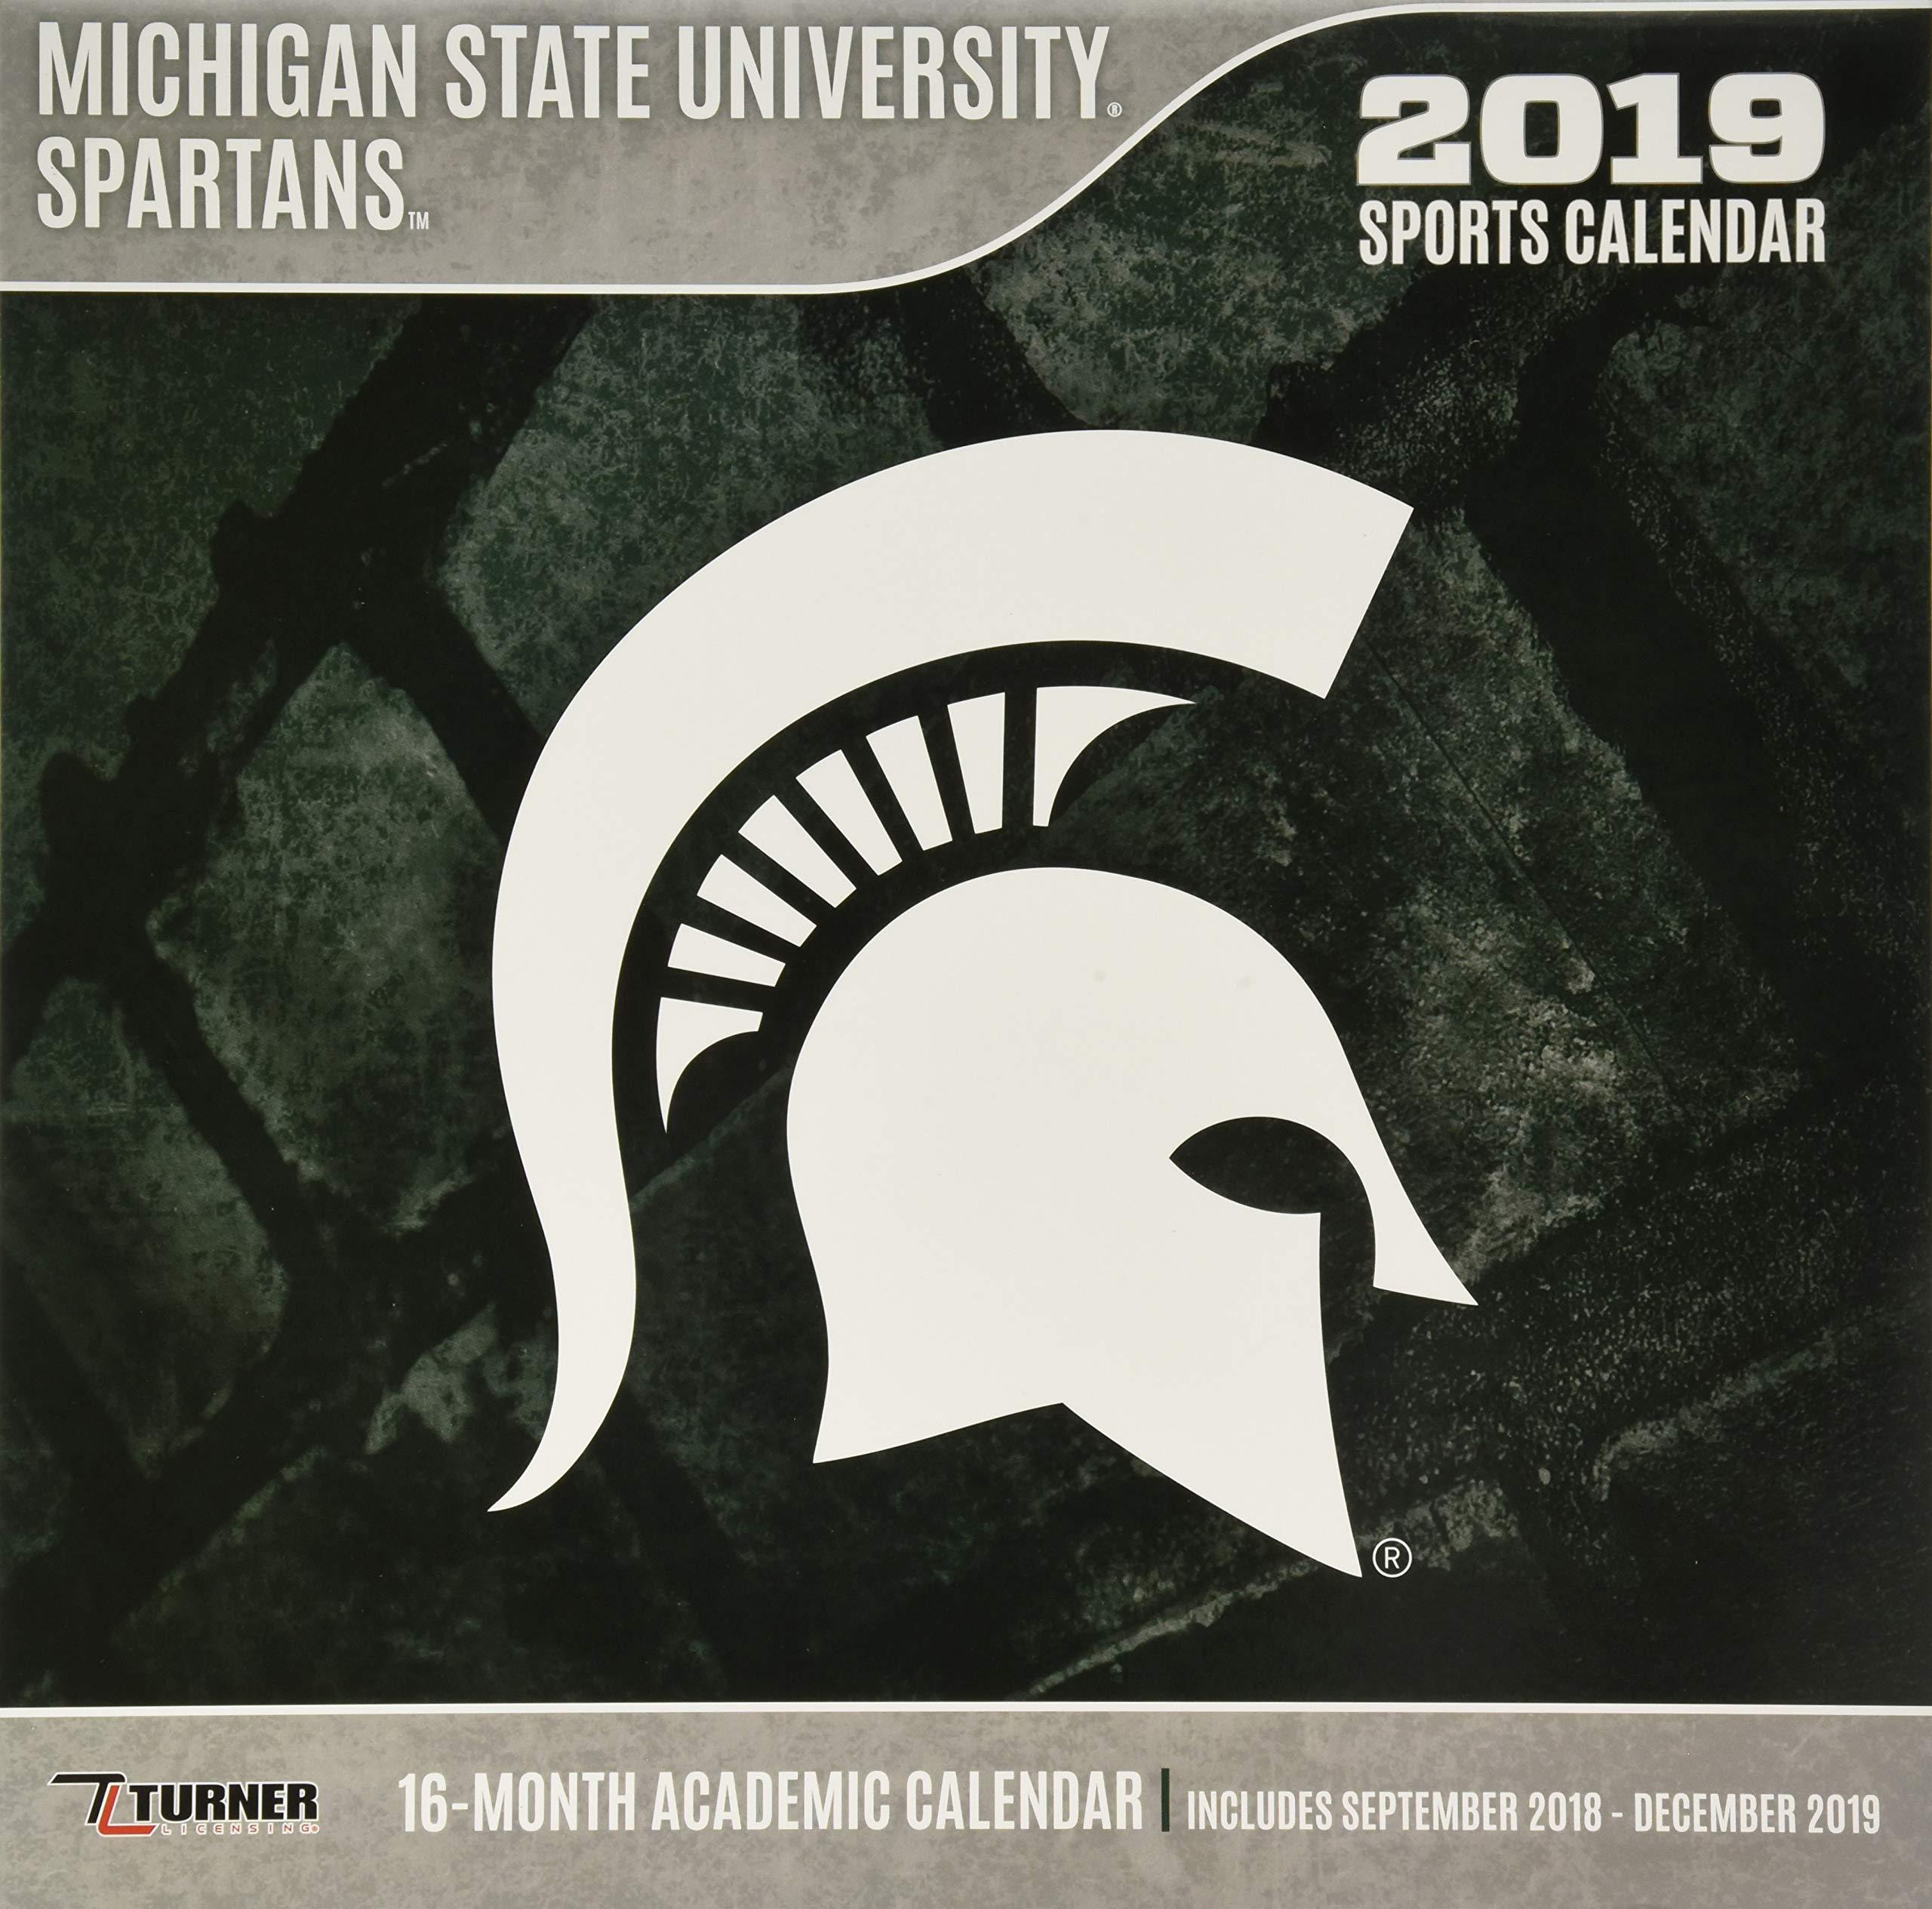 Michigan State Academic Calendar 2019 Michigan State Spartans 2019 calendario: Lang Holdings Inc